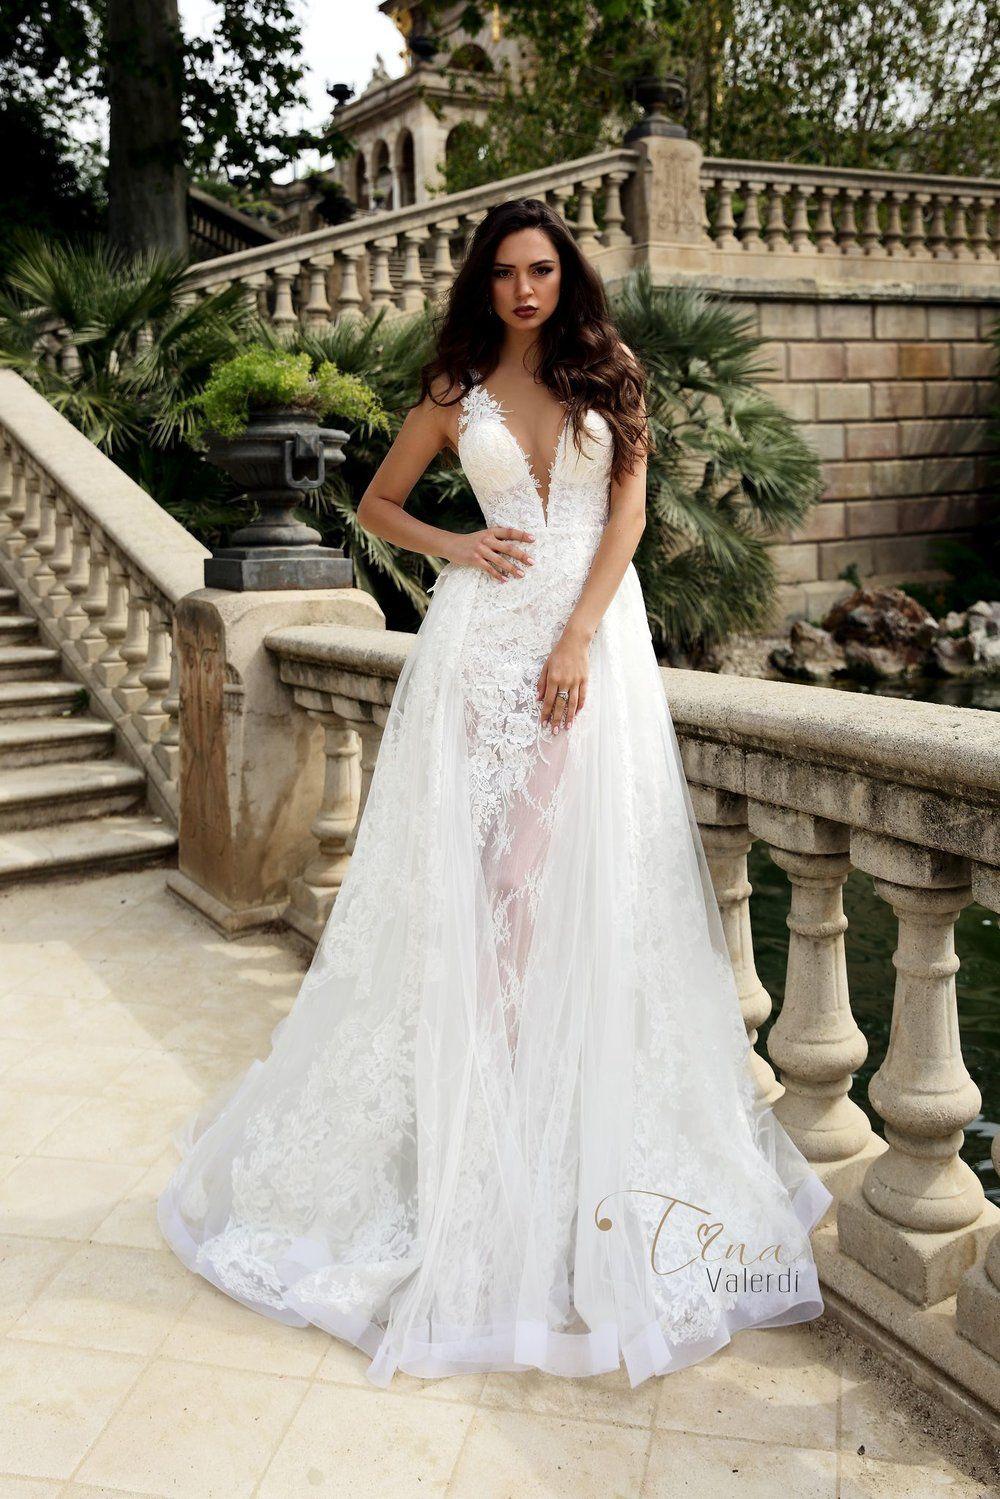 Mariana Wedding Dress By Tina Valerdi Wedding Dresses European Wedding Dresses Wedding Dresses Lace